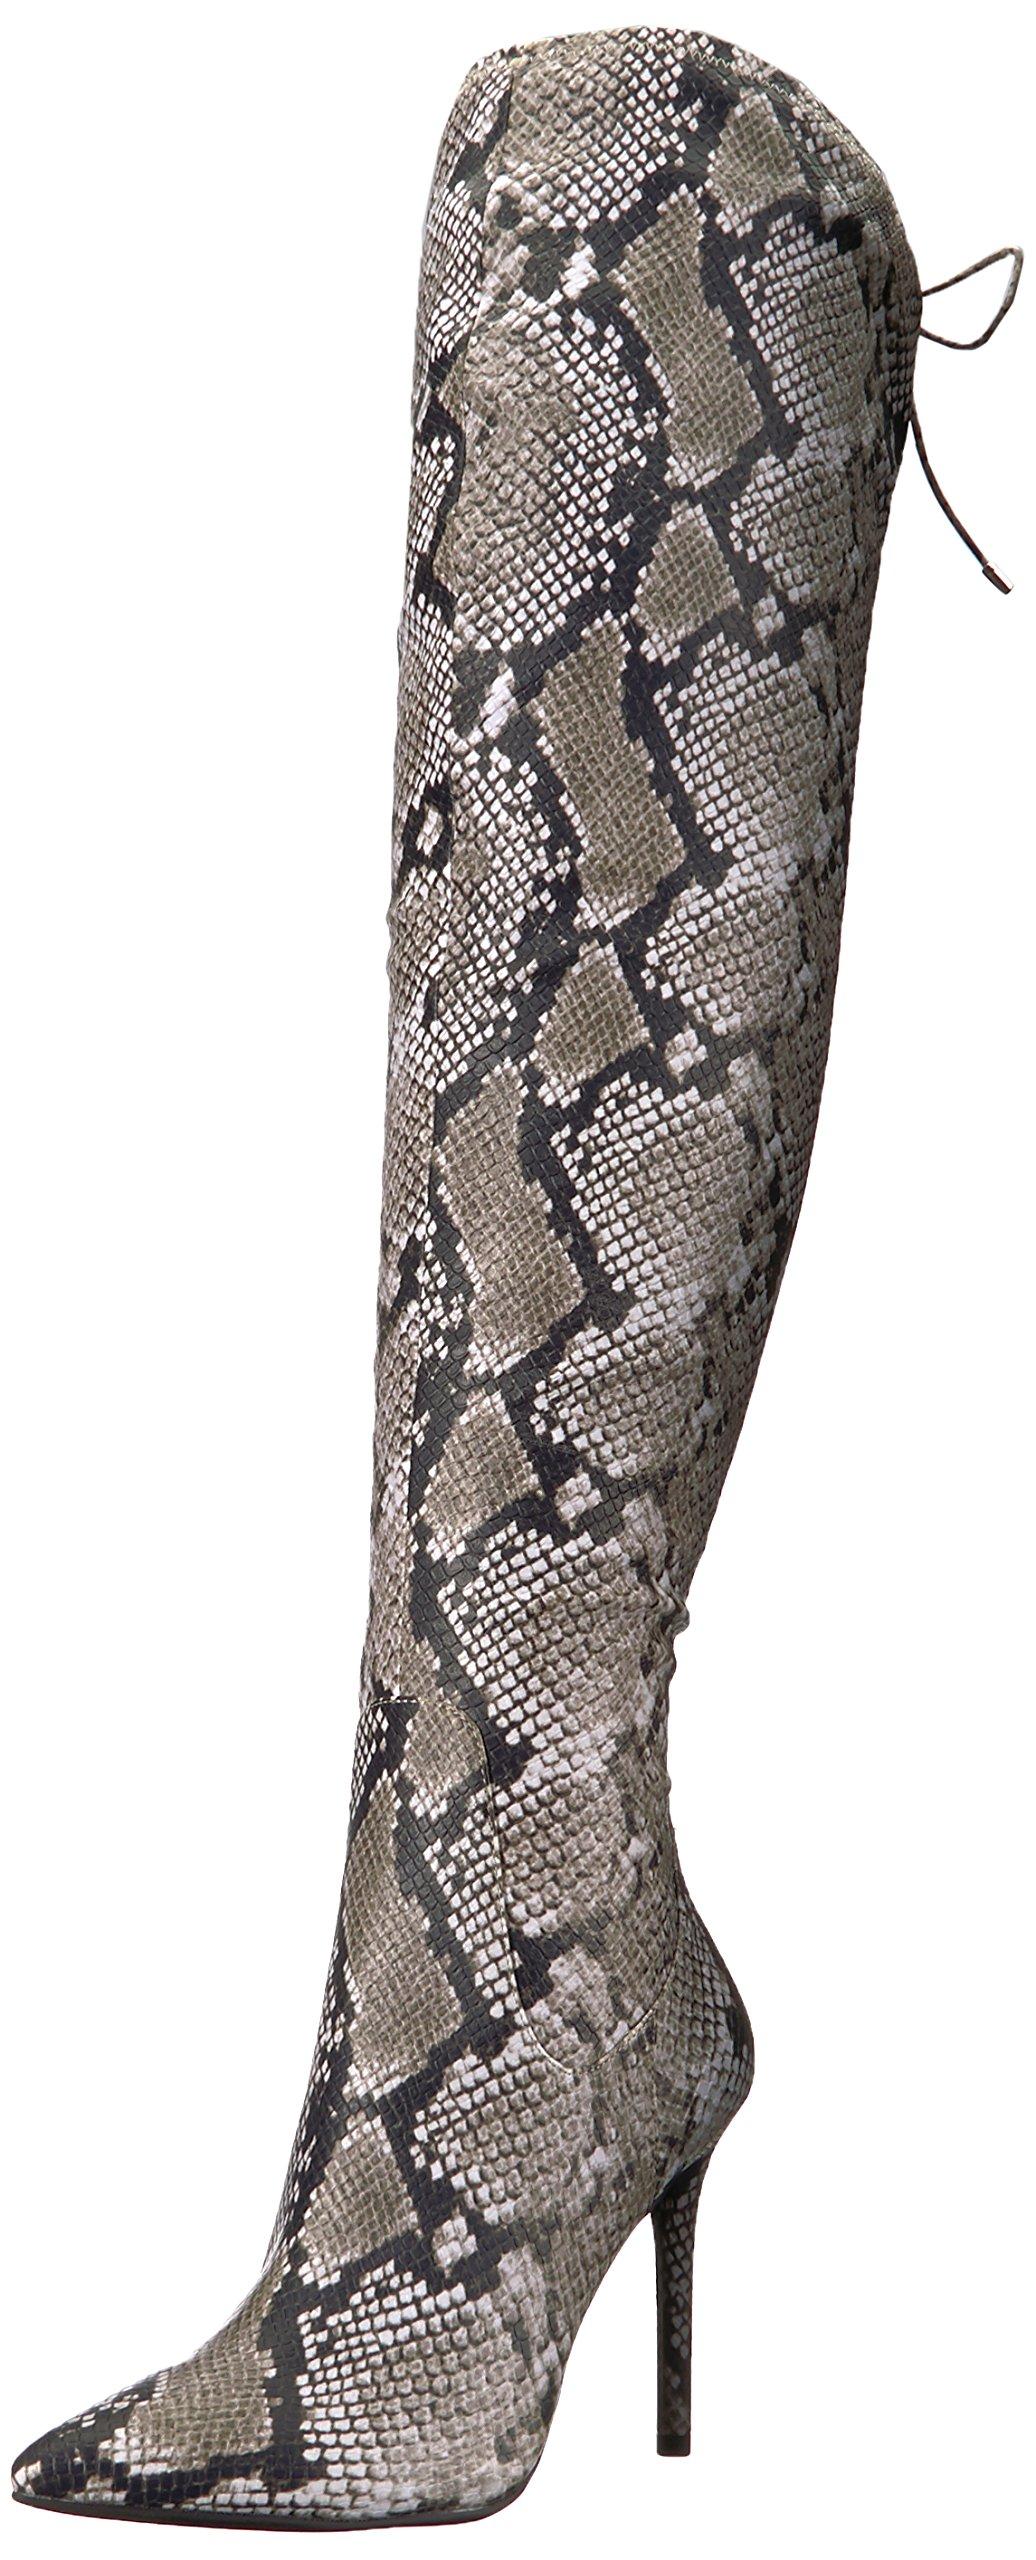 Jessica Simpson Women's Londy Fashion Boot, Natural, 5.5 Medium US